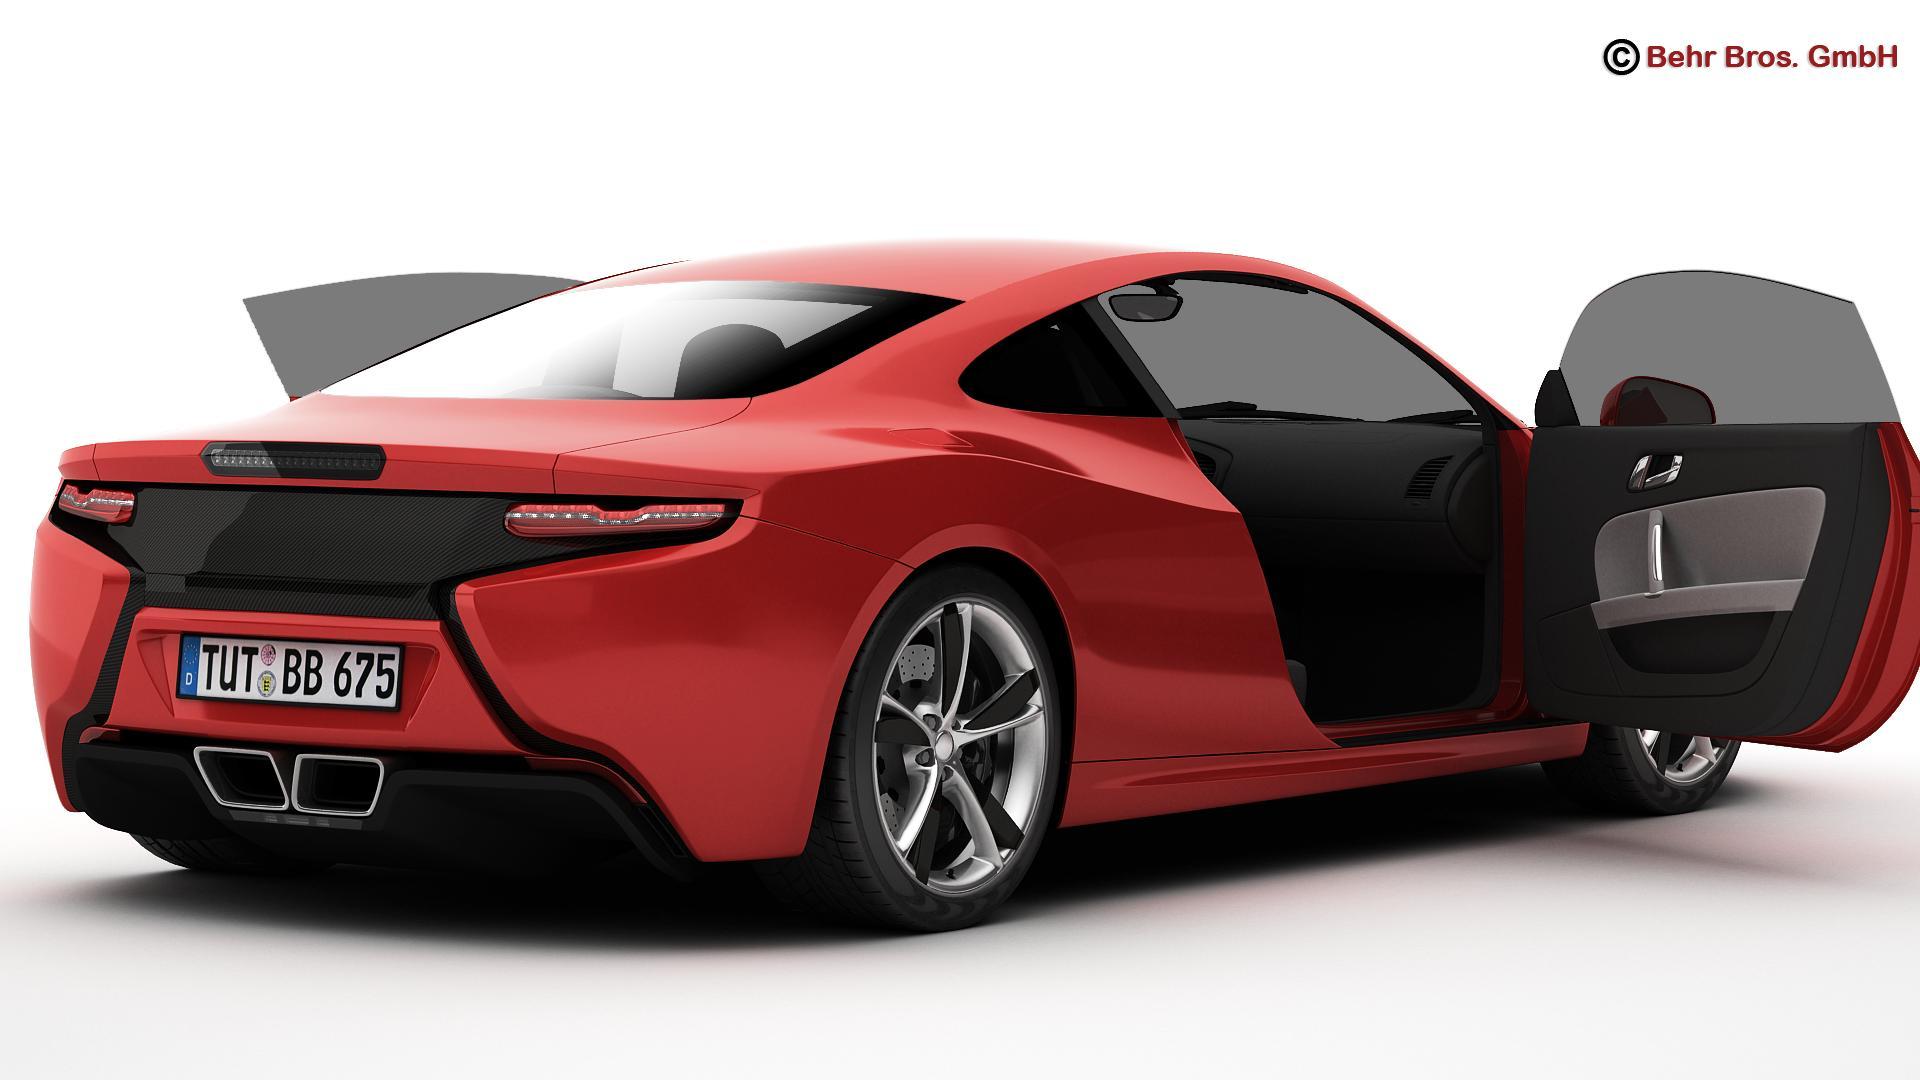 generic sports car 3d model 3ds max fbx c4d lwo ma mb obj 160523